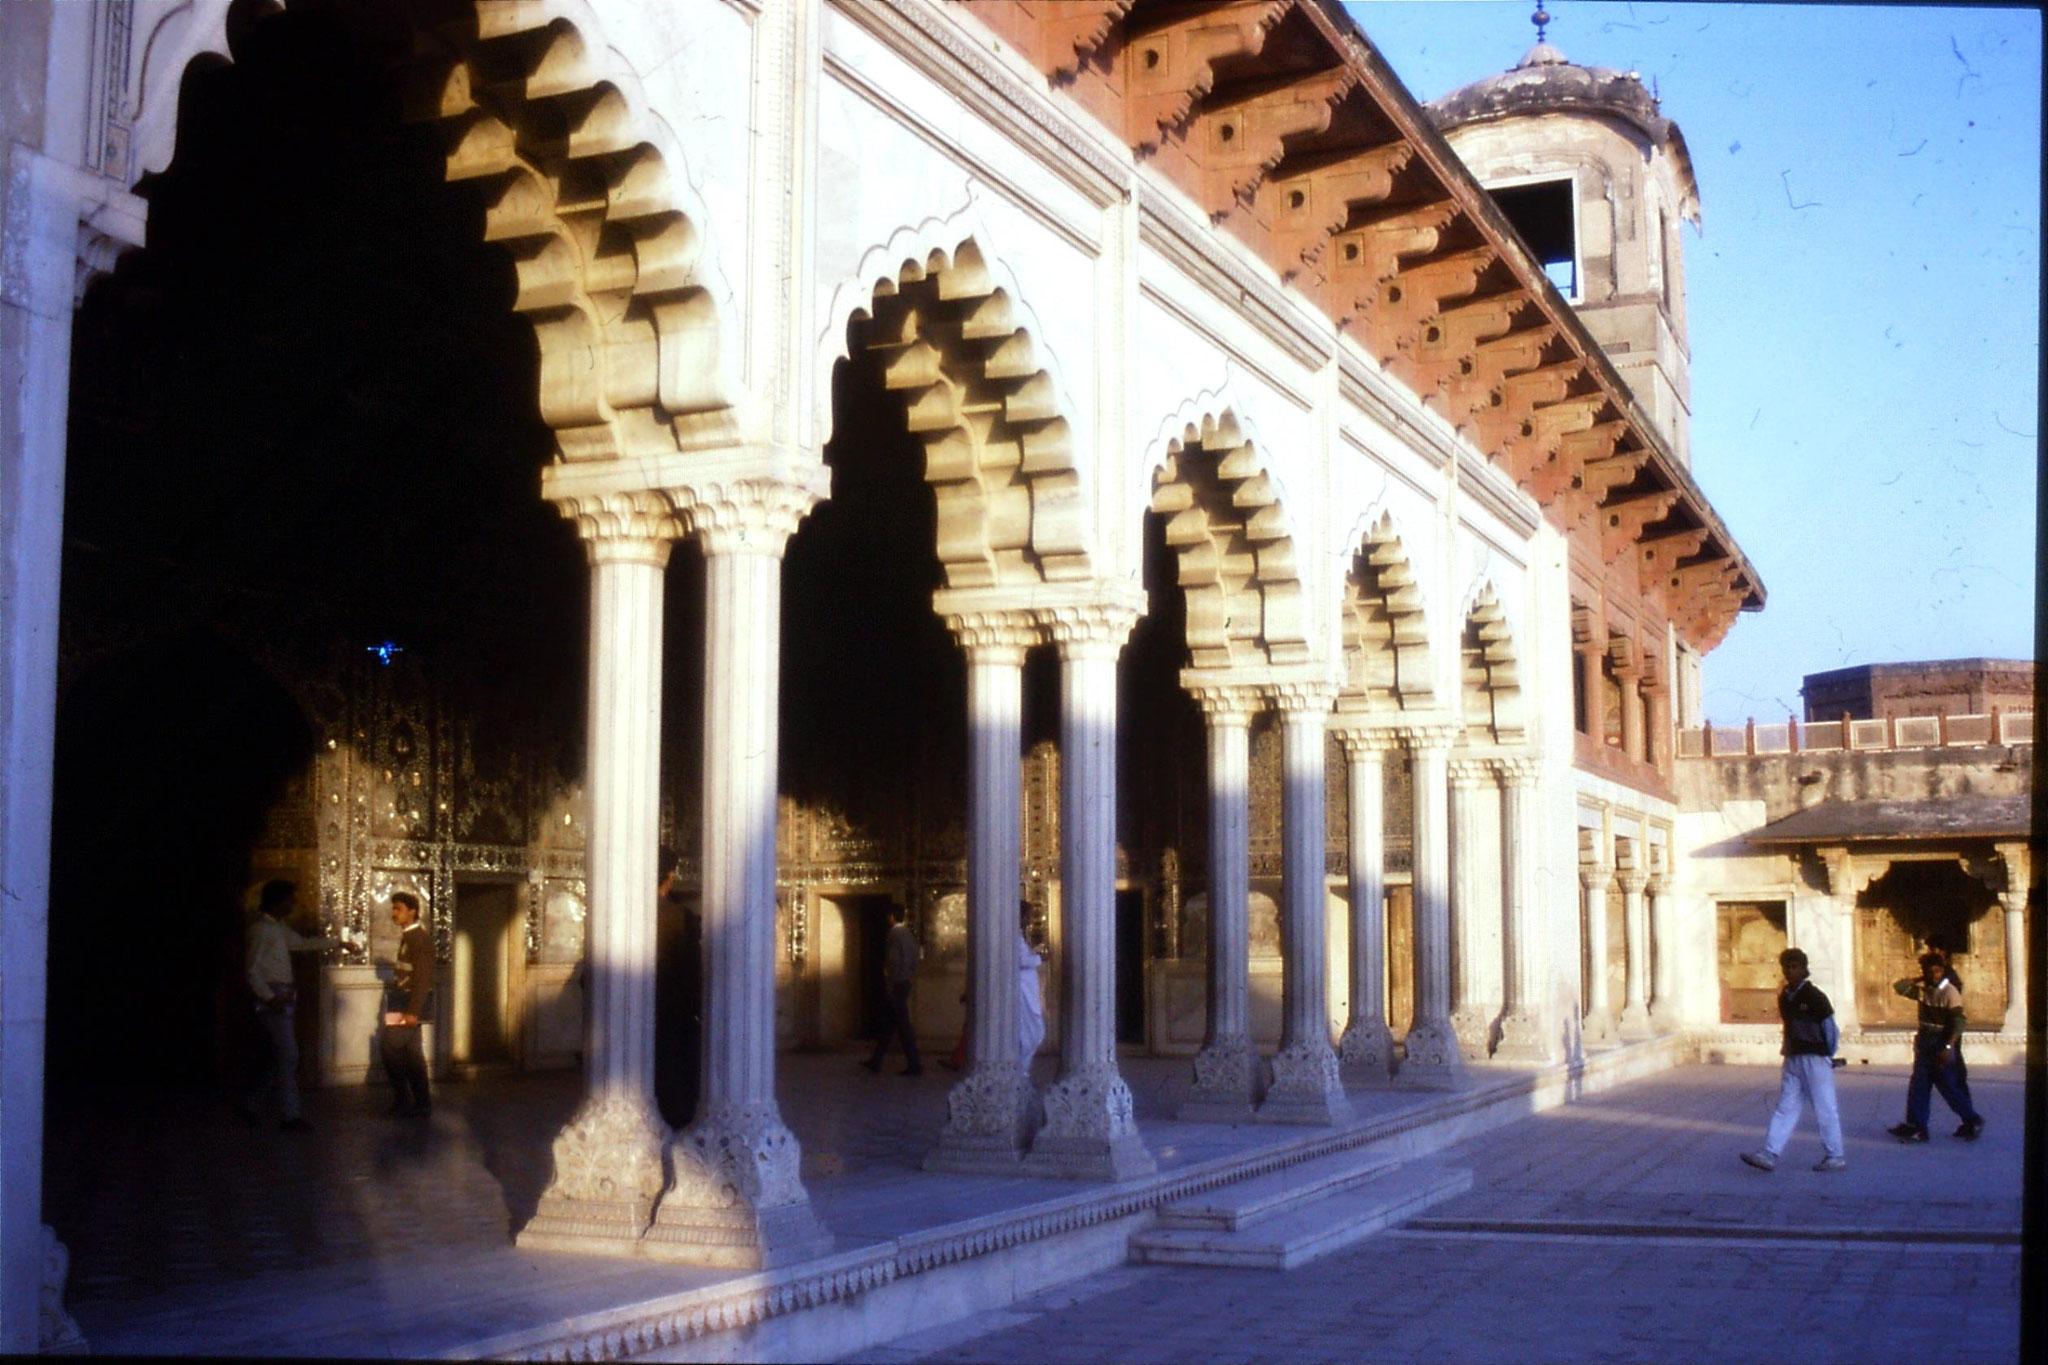 15/11/1989: 10: Lahore Fort, Shah Burj Shish Mahal